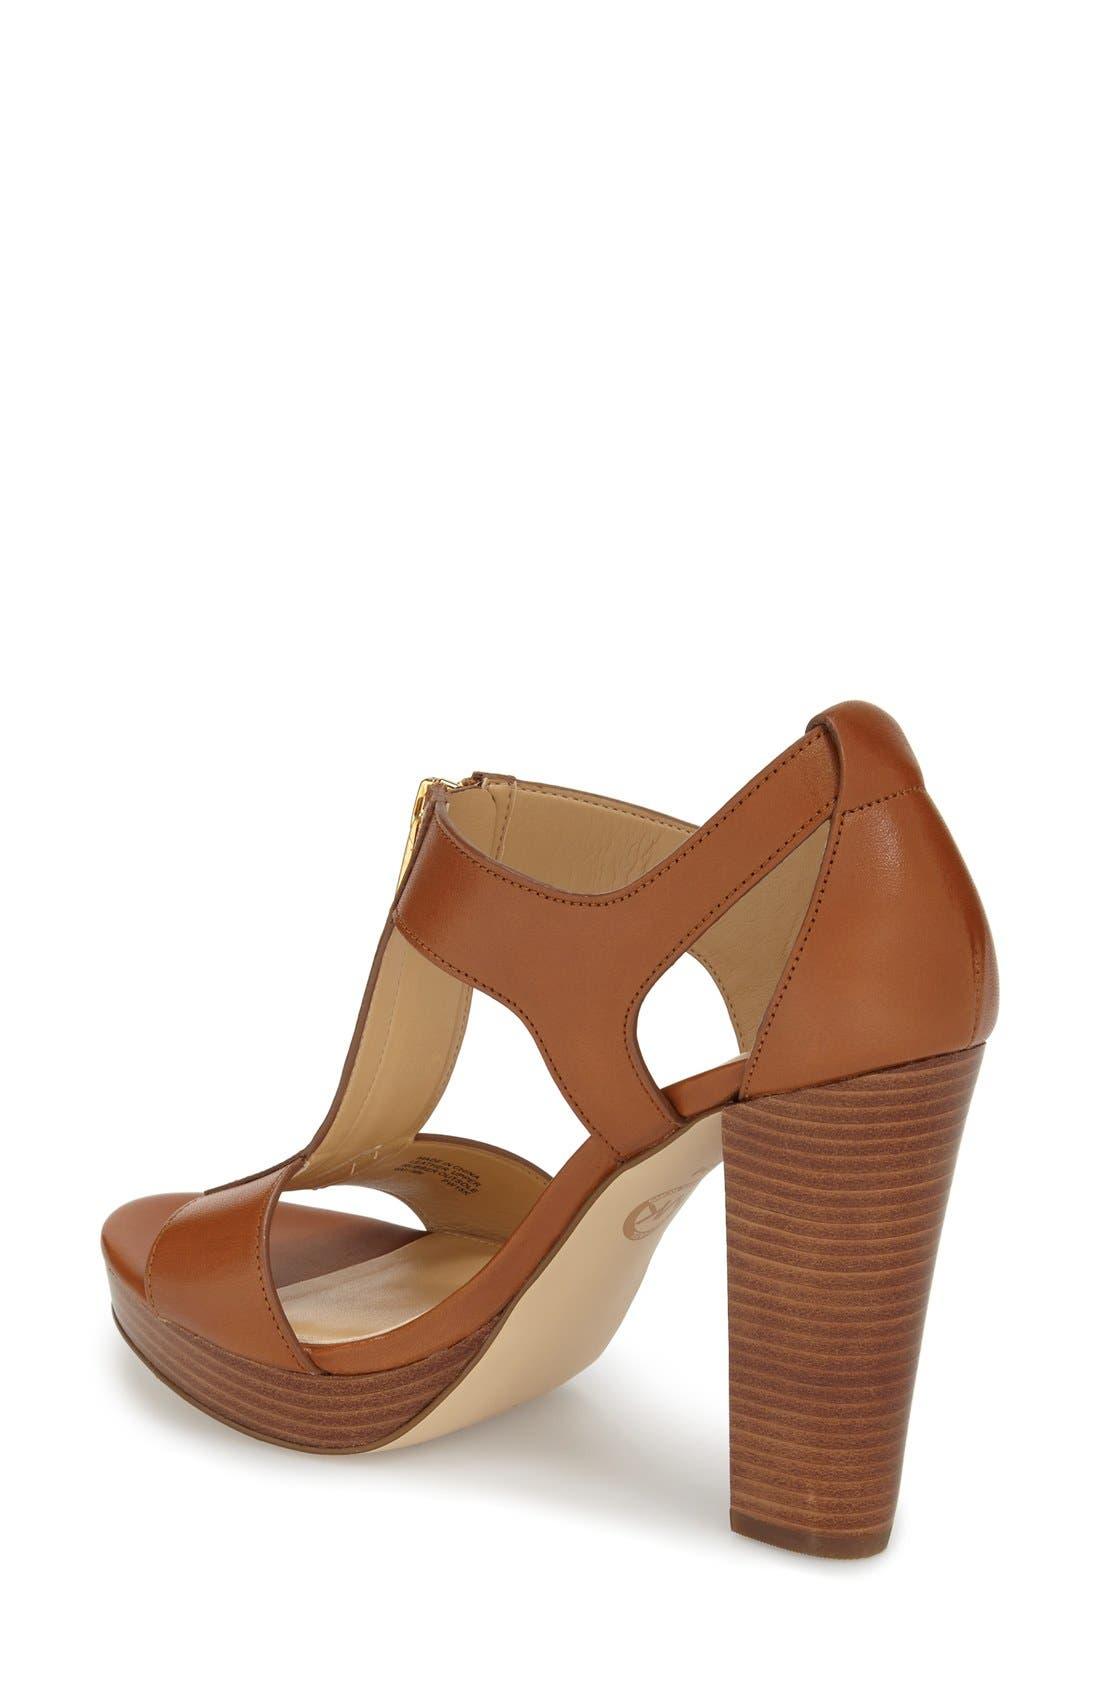 Donna front zipper scarpe   Nordstrom Nordstrom Nordstrom 6e32e6